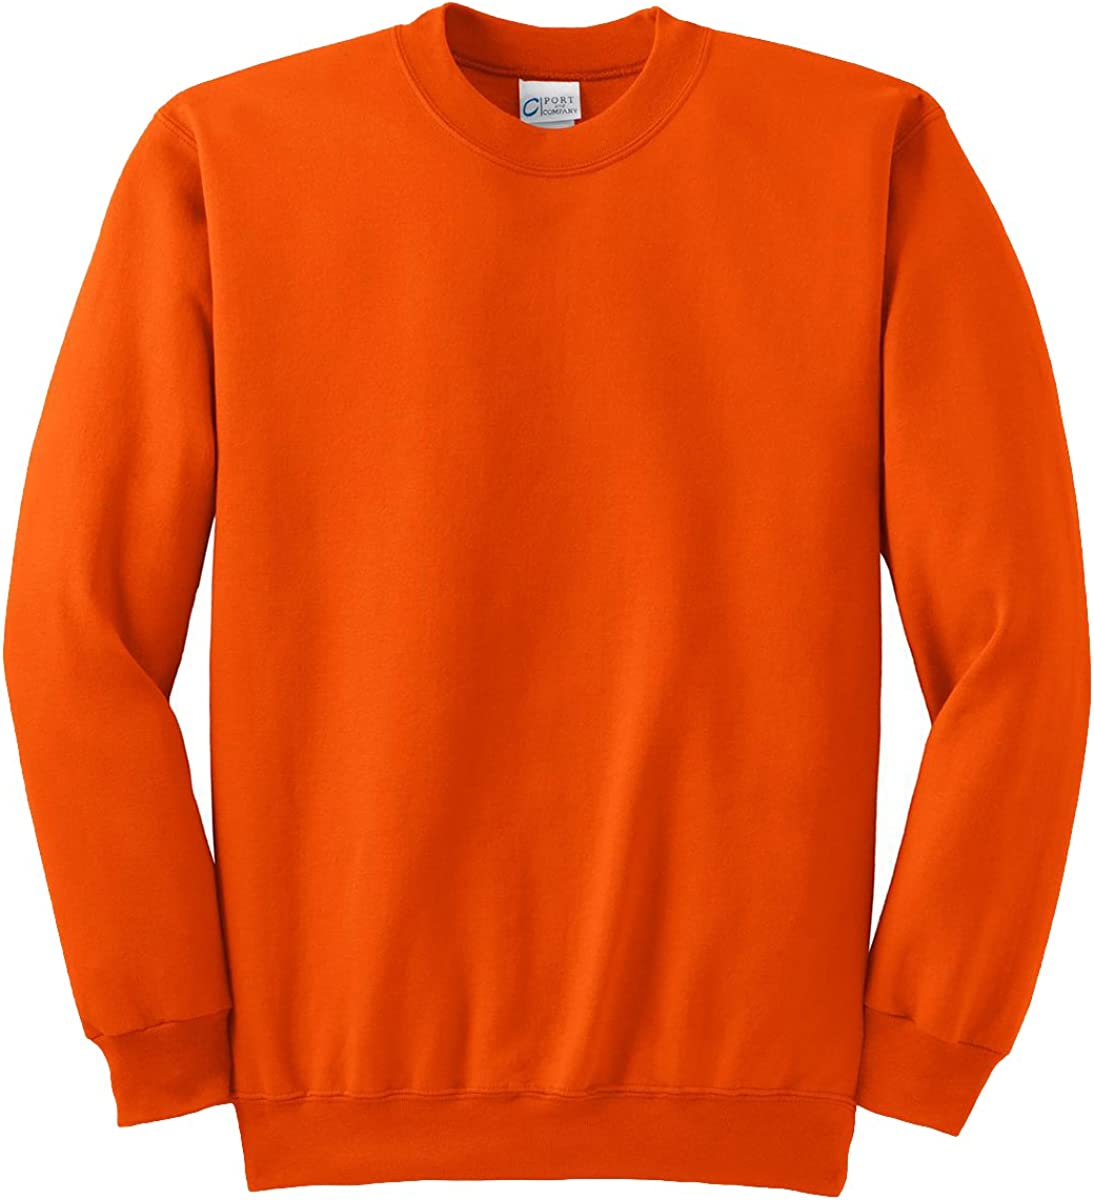 Port & Company Tall Ultimate Crewneck Sweatshirt>4XLT Orange PC90T